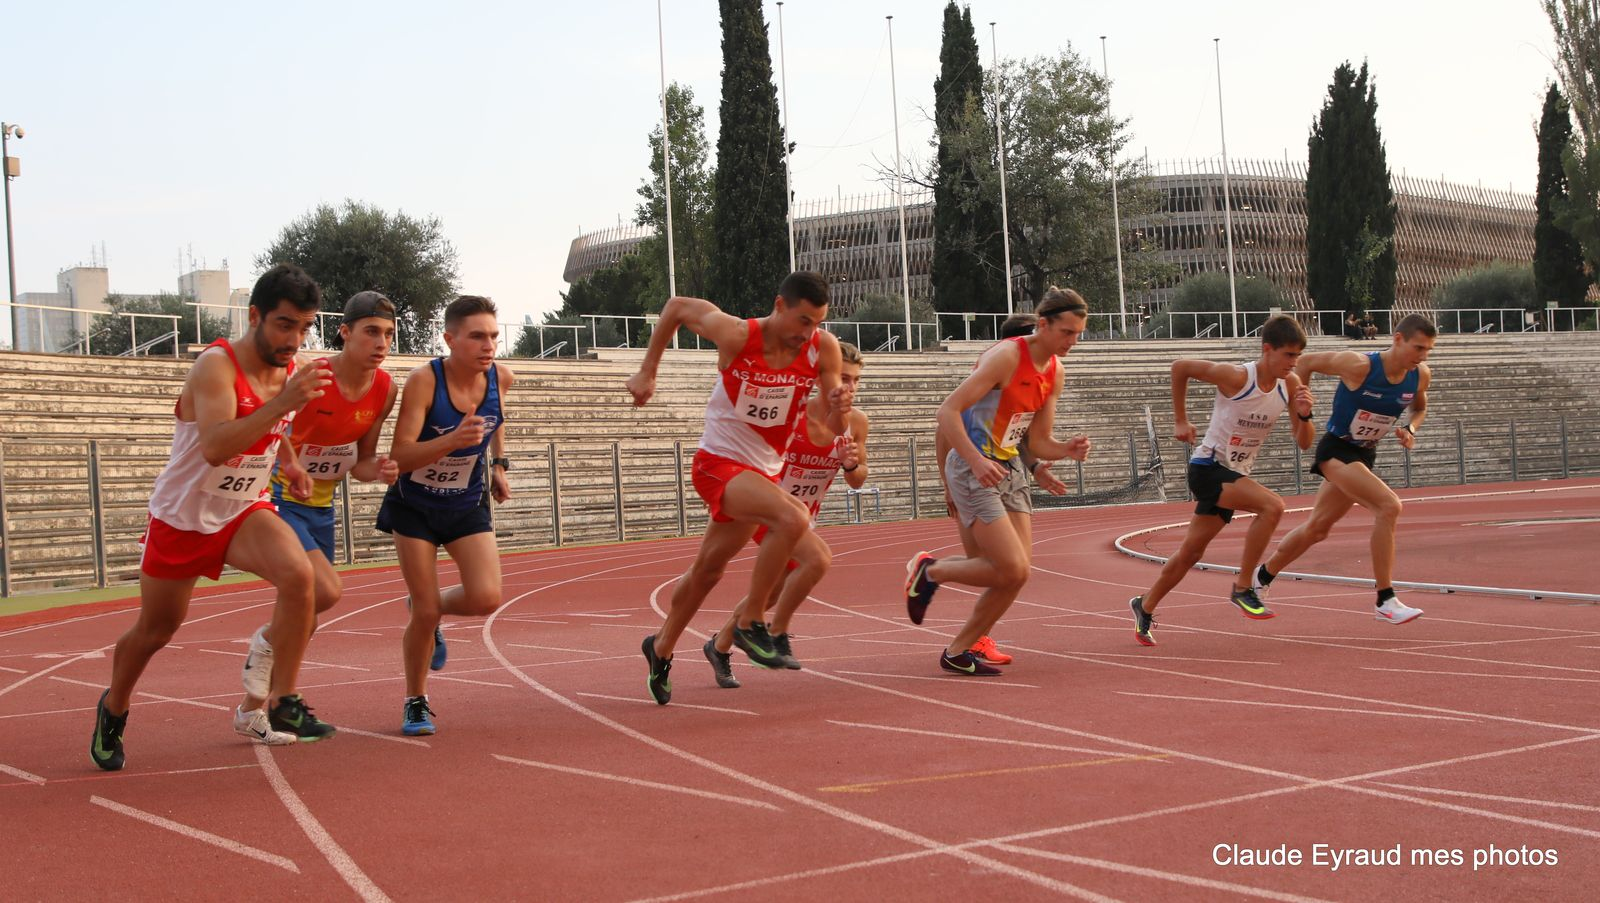 SOIREES NCAA  les 400 et 1500 metres